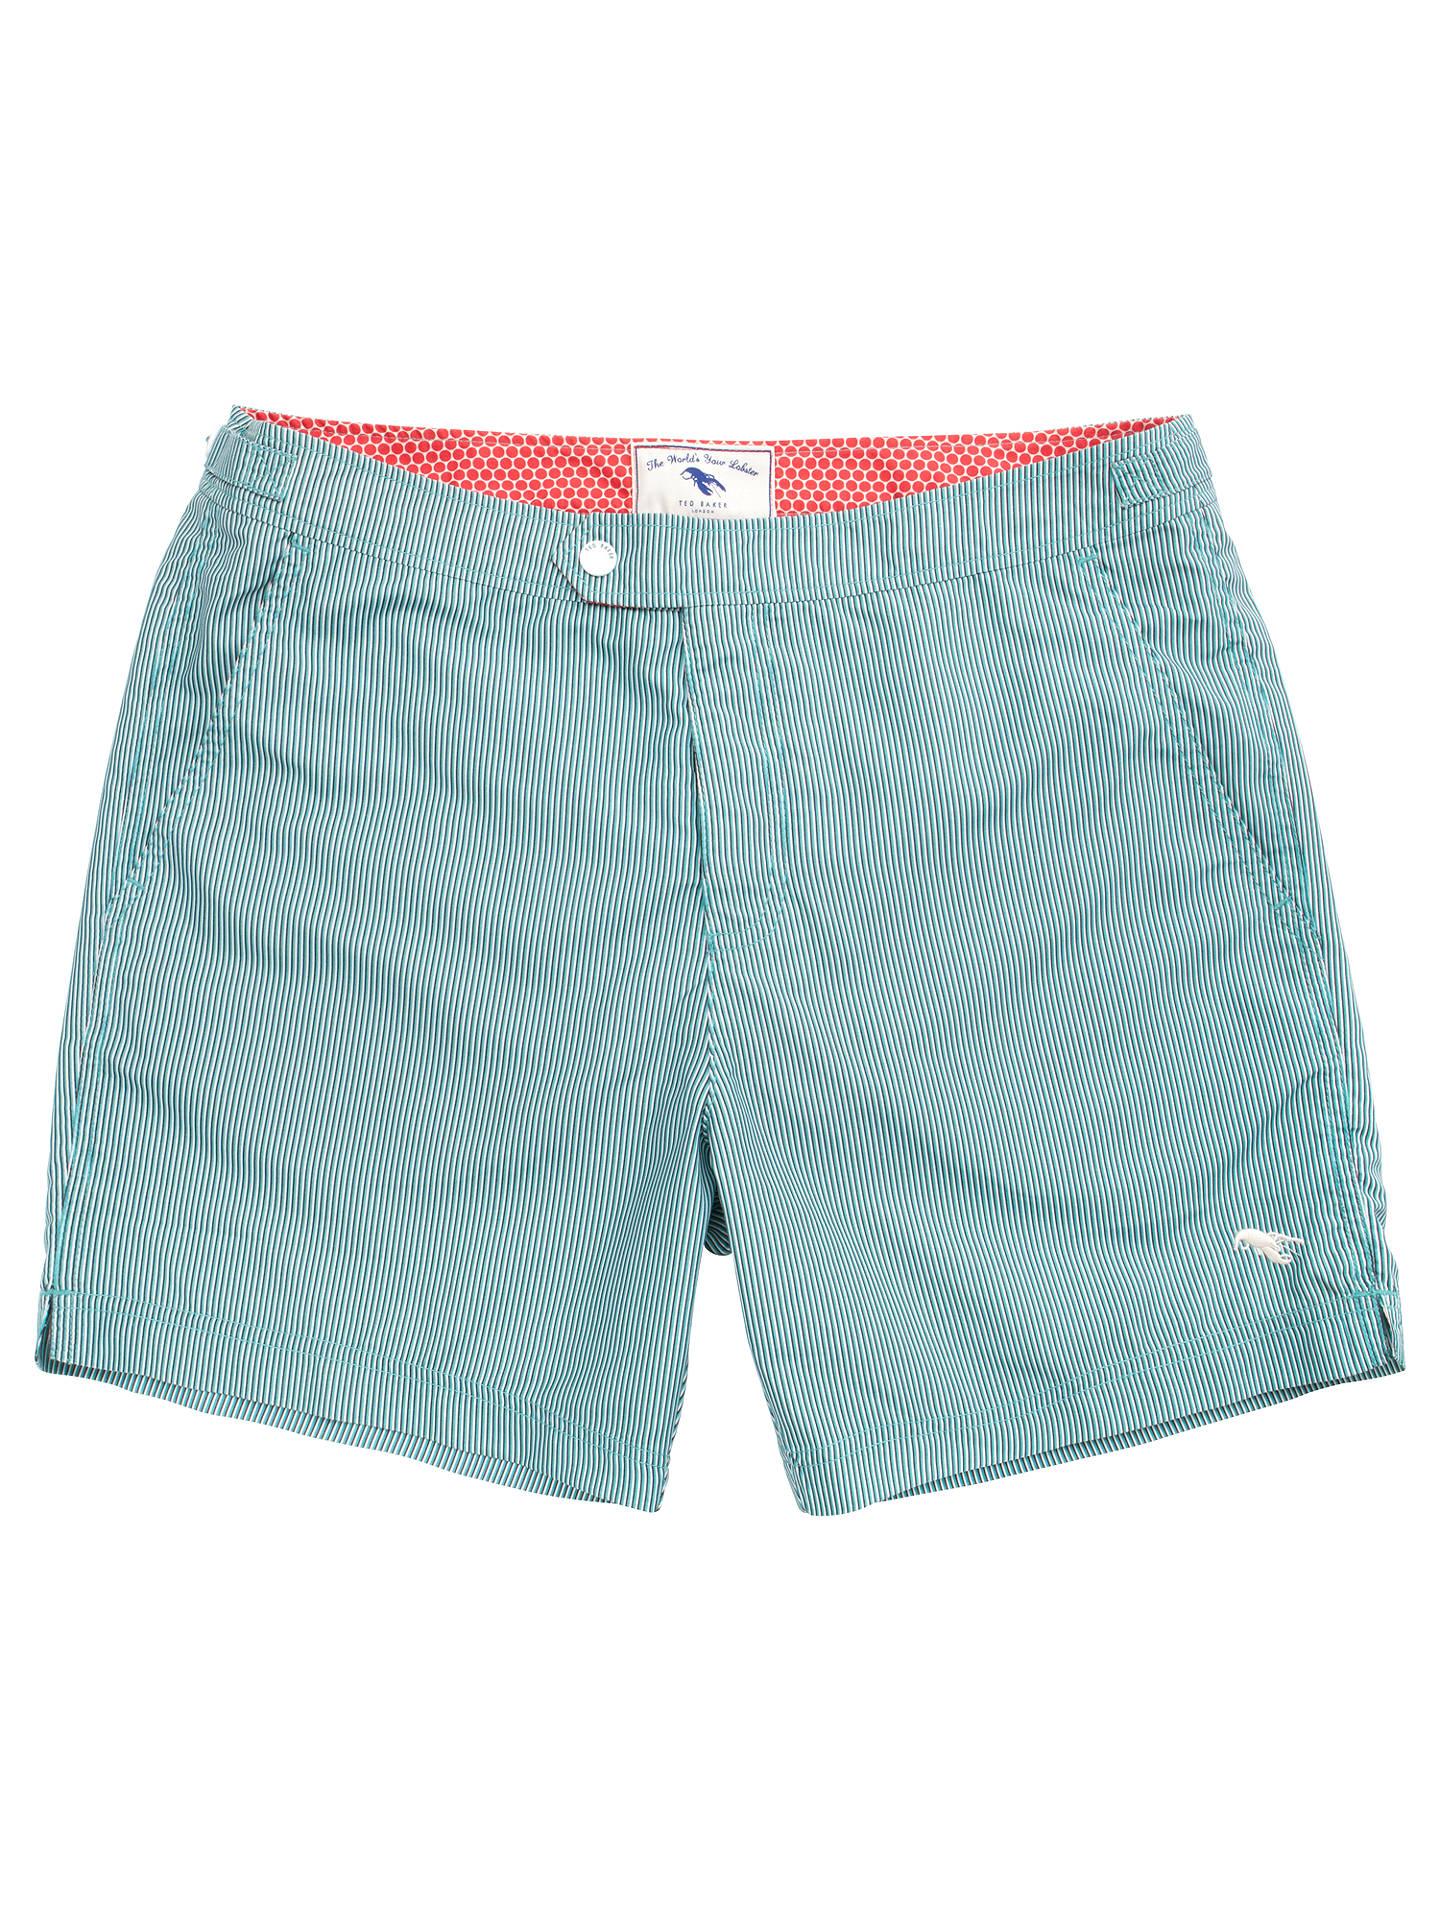 dc287c8d846d Buy Ted Baker Bufpop Pinstripe Swim Shorts, Teal, 2 Online at johnlewis.com